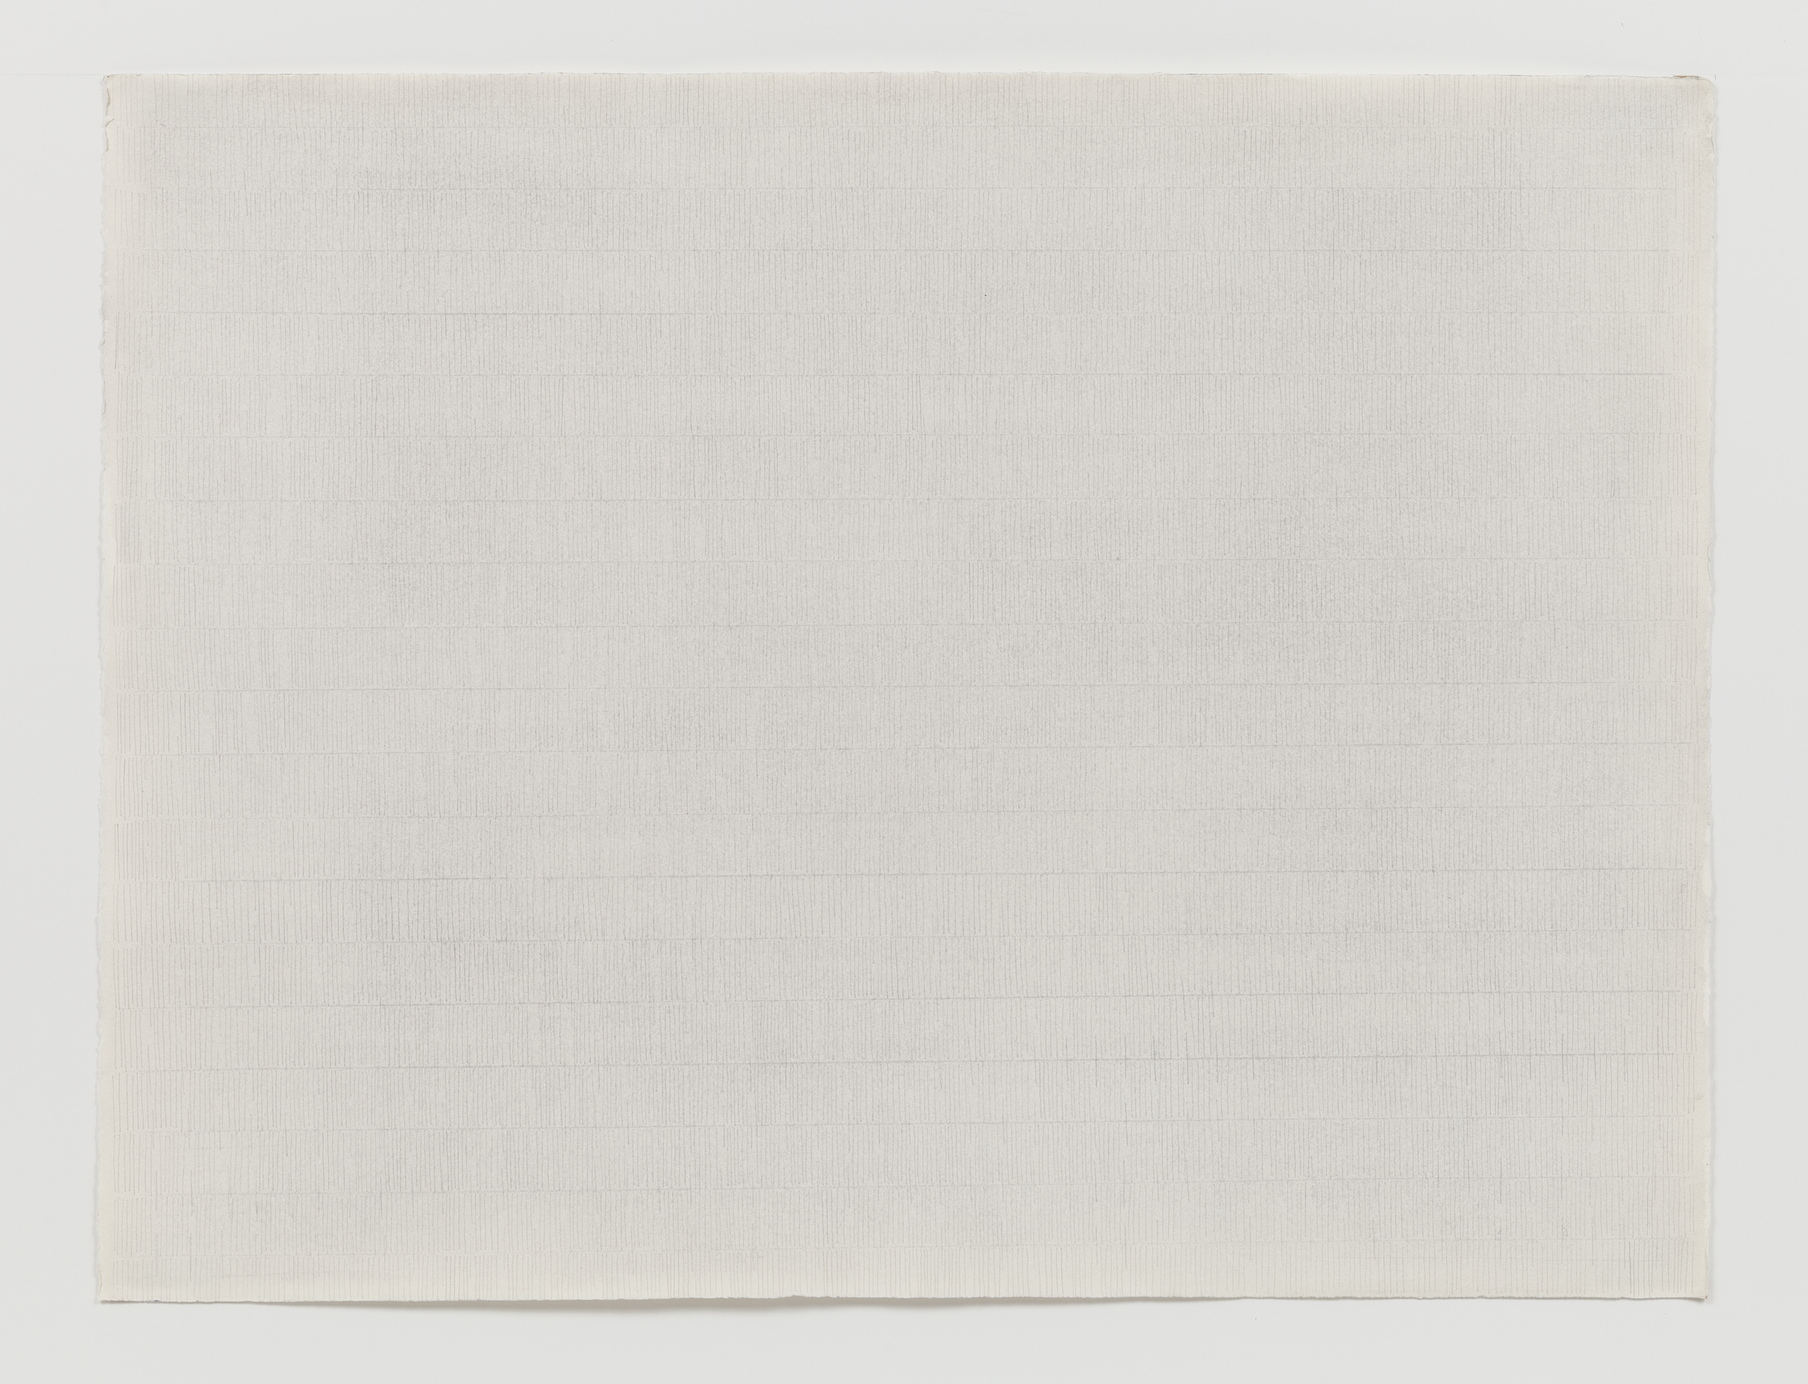 Rudolf de Crignis, Painting No. 91121, 1991